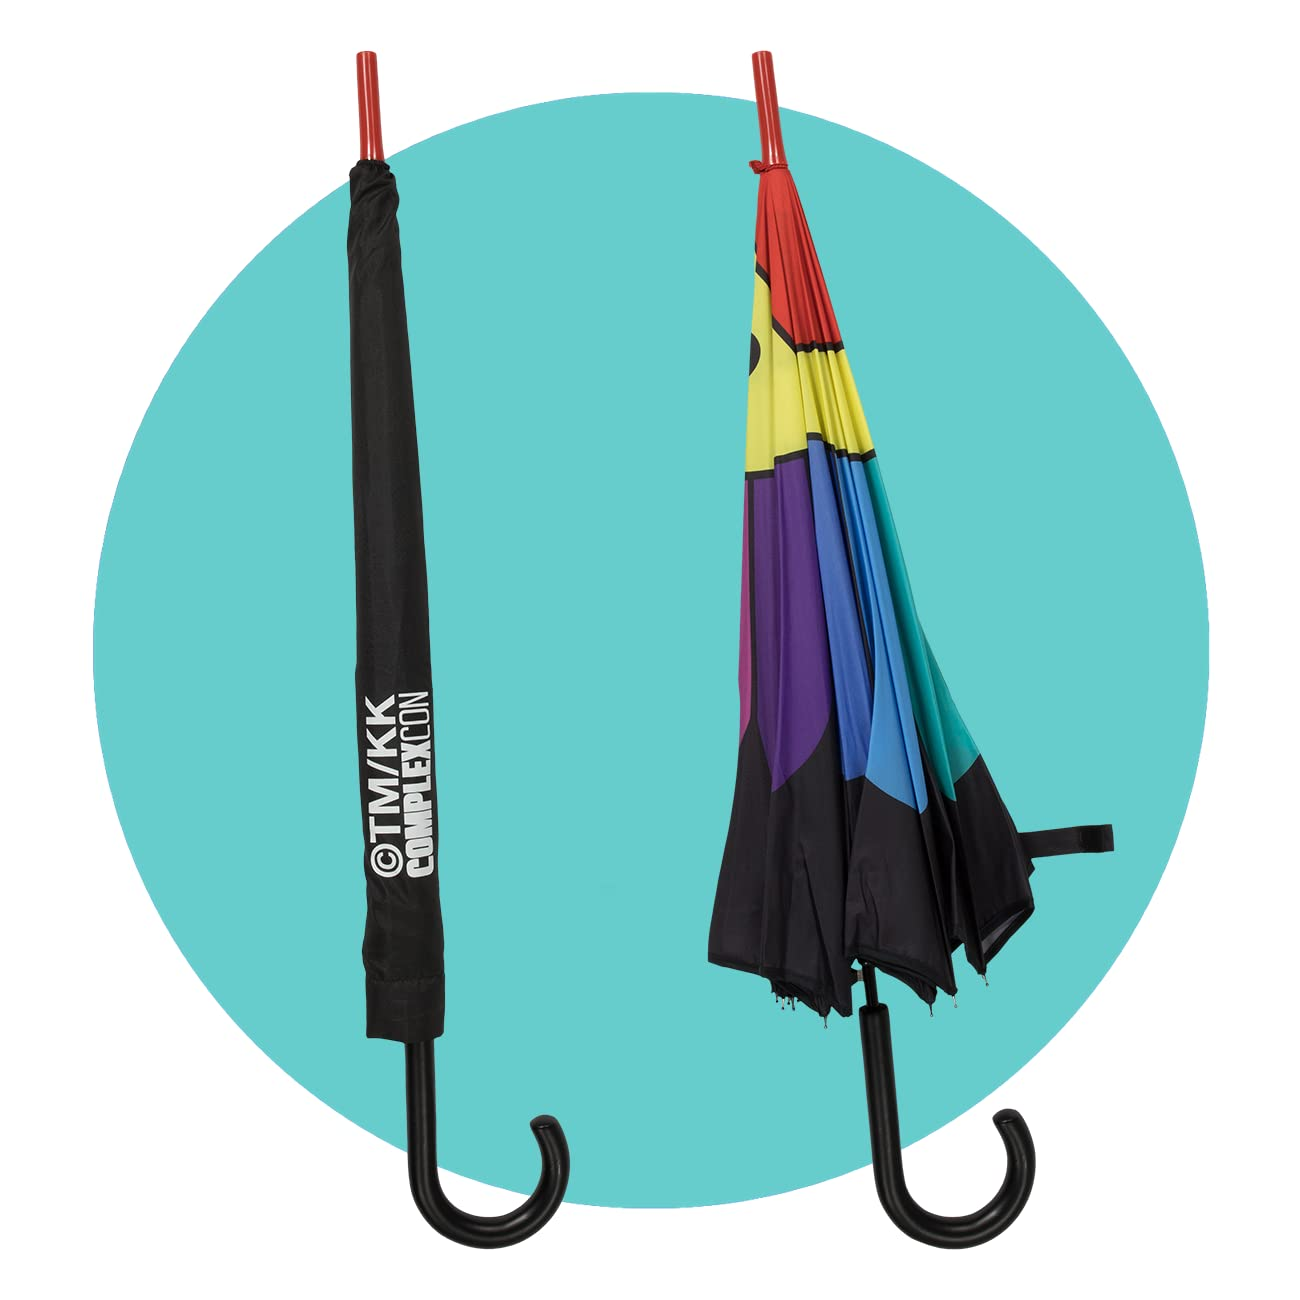 ComplexCon Takashi Murakami Flower Umbrella